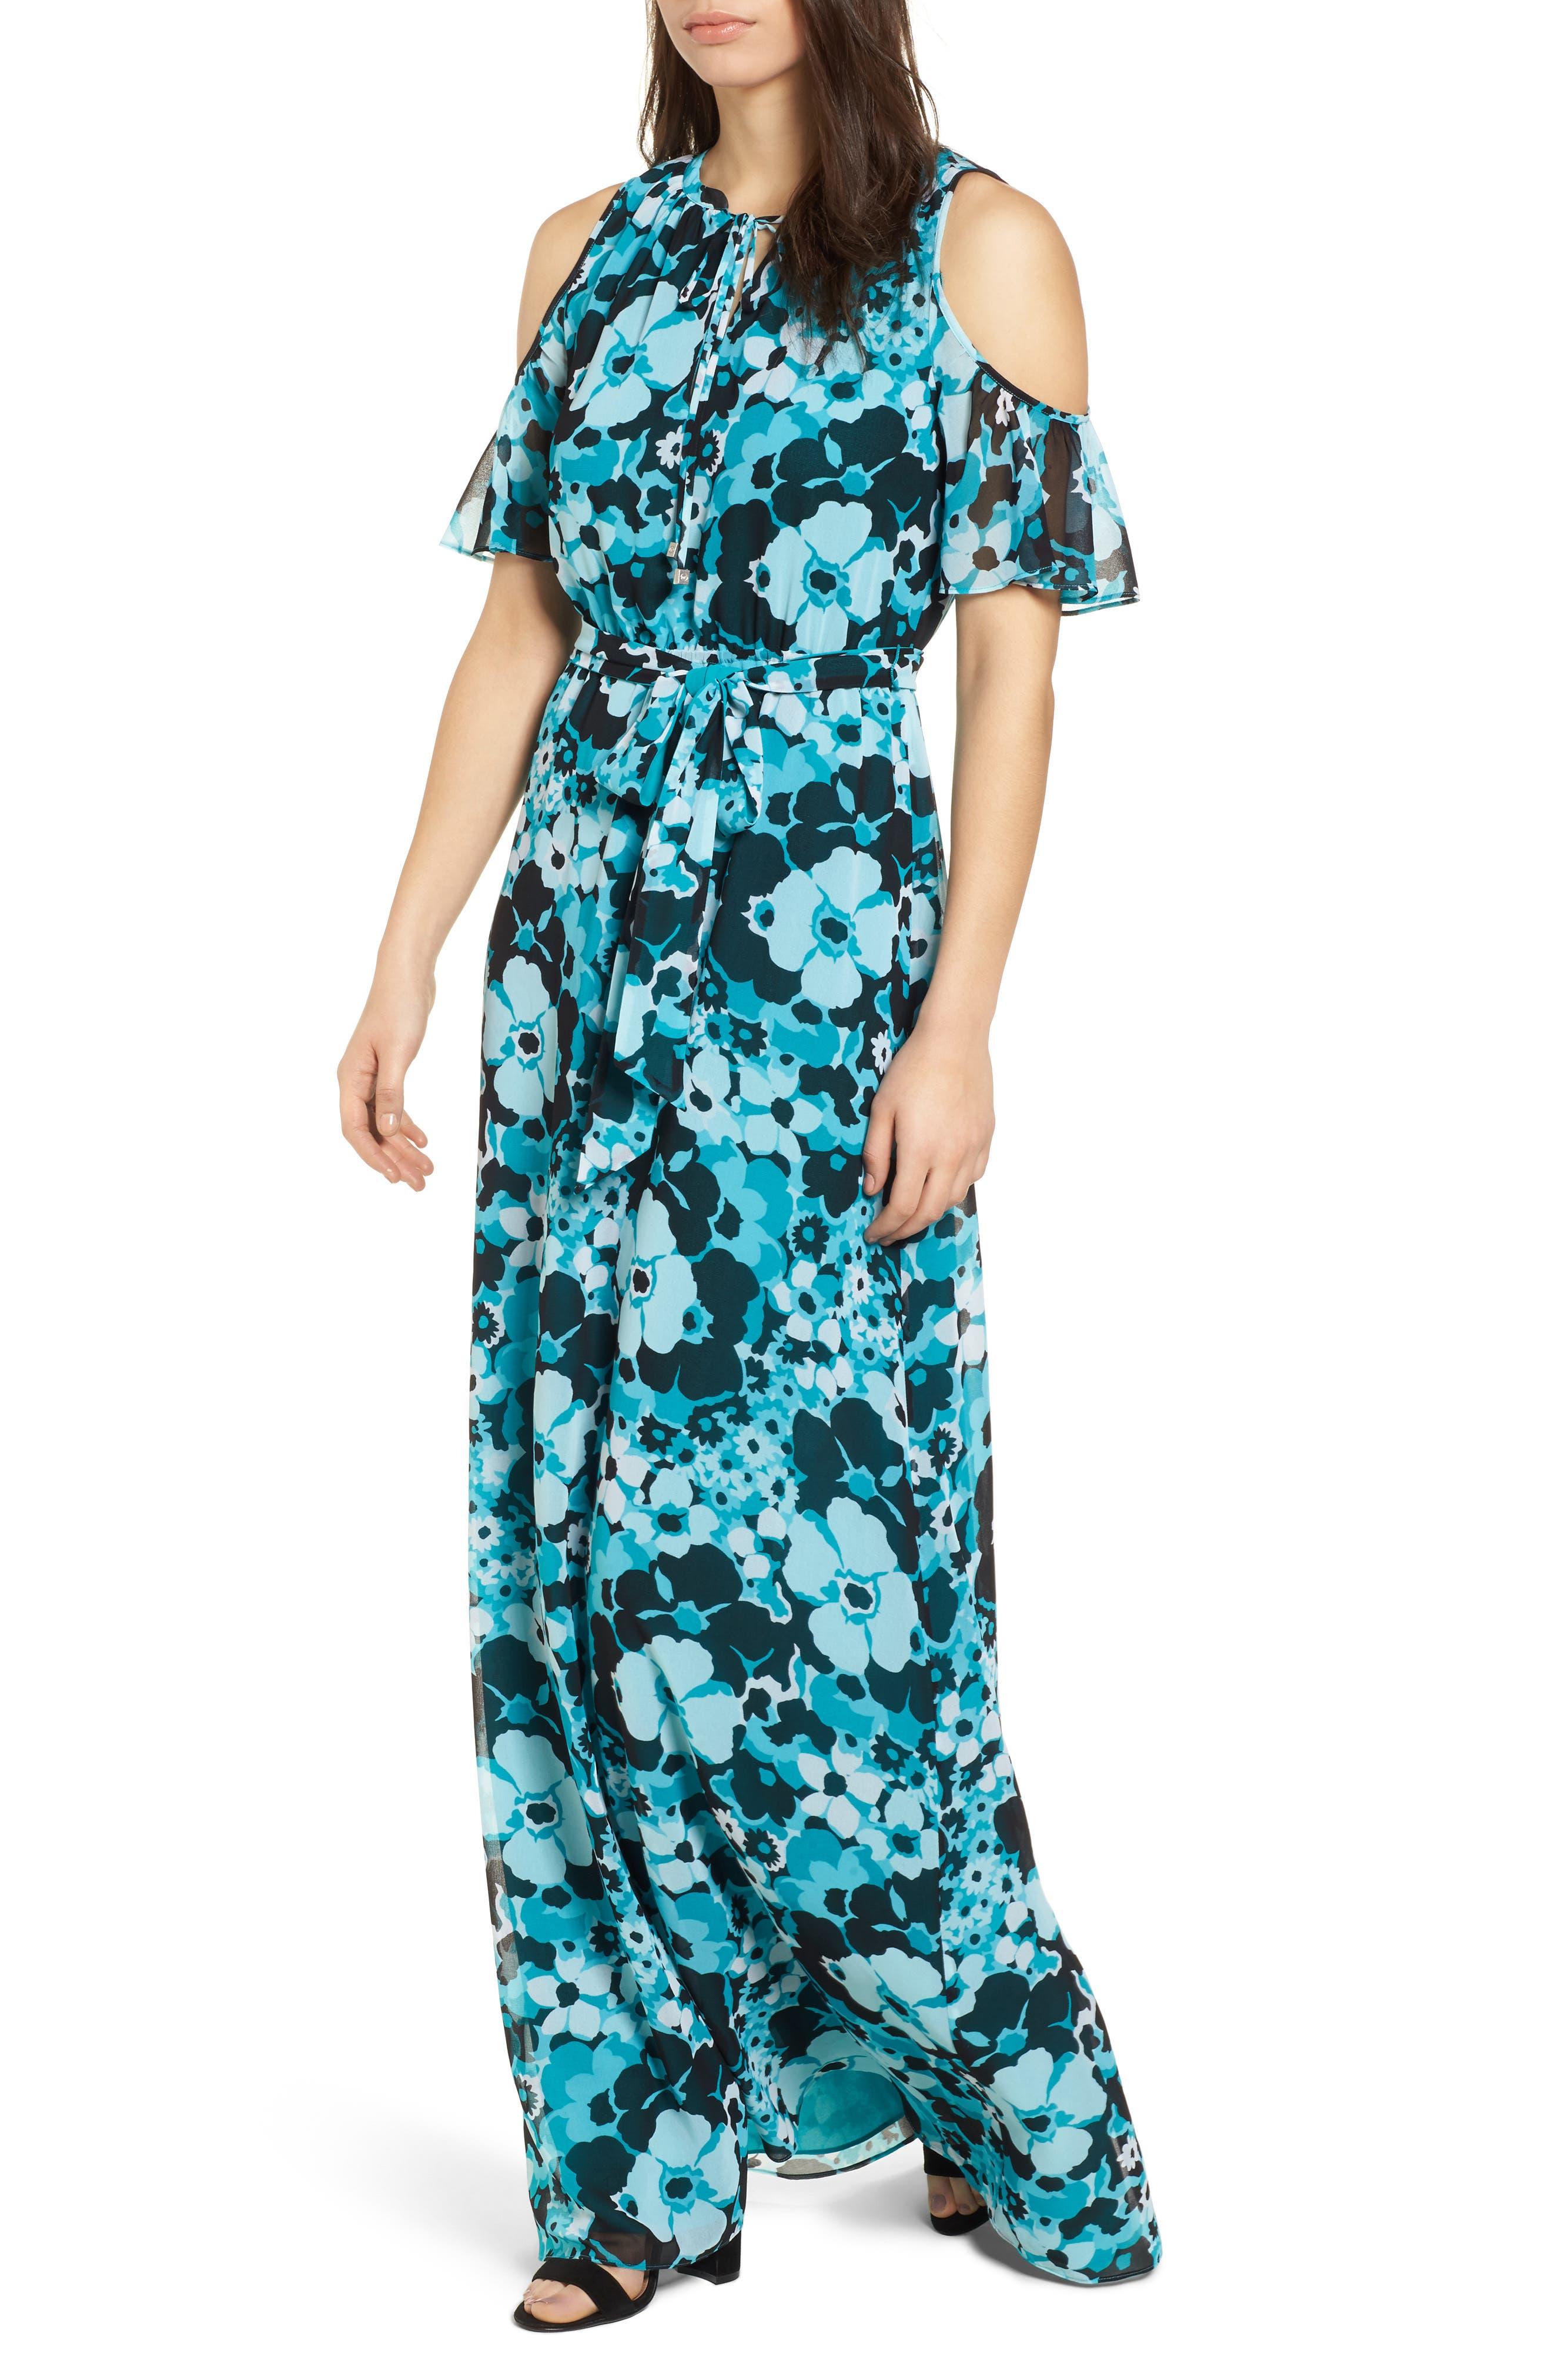 Spring Floral Maxi Dress,                             Main thumbnail 1, color,                             Tile Blue/ Black Multi